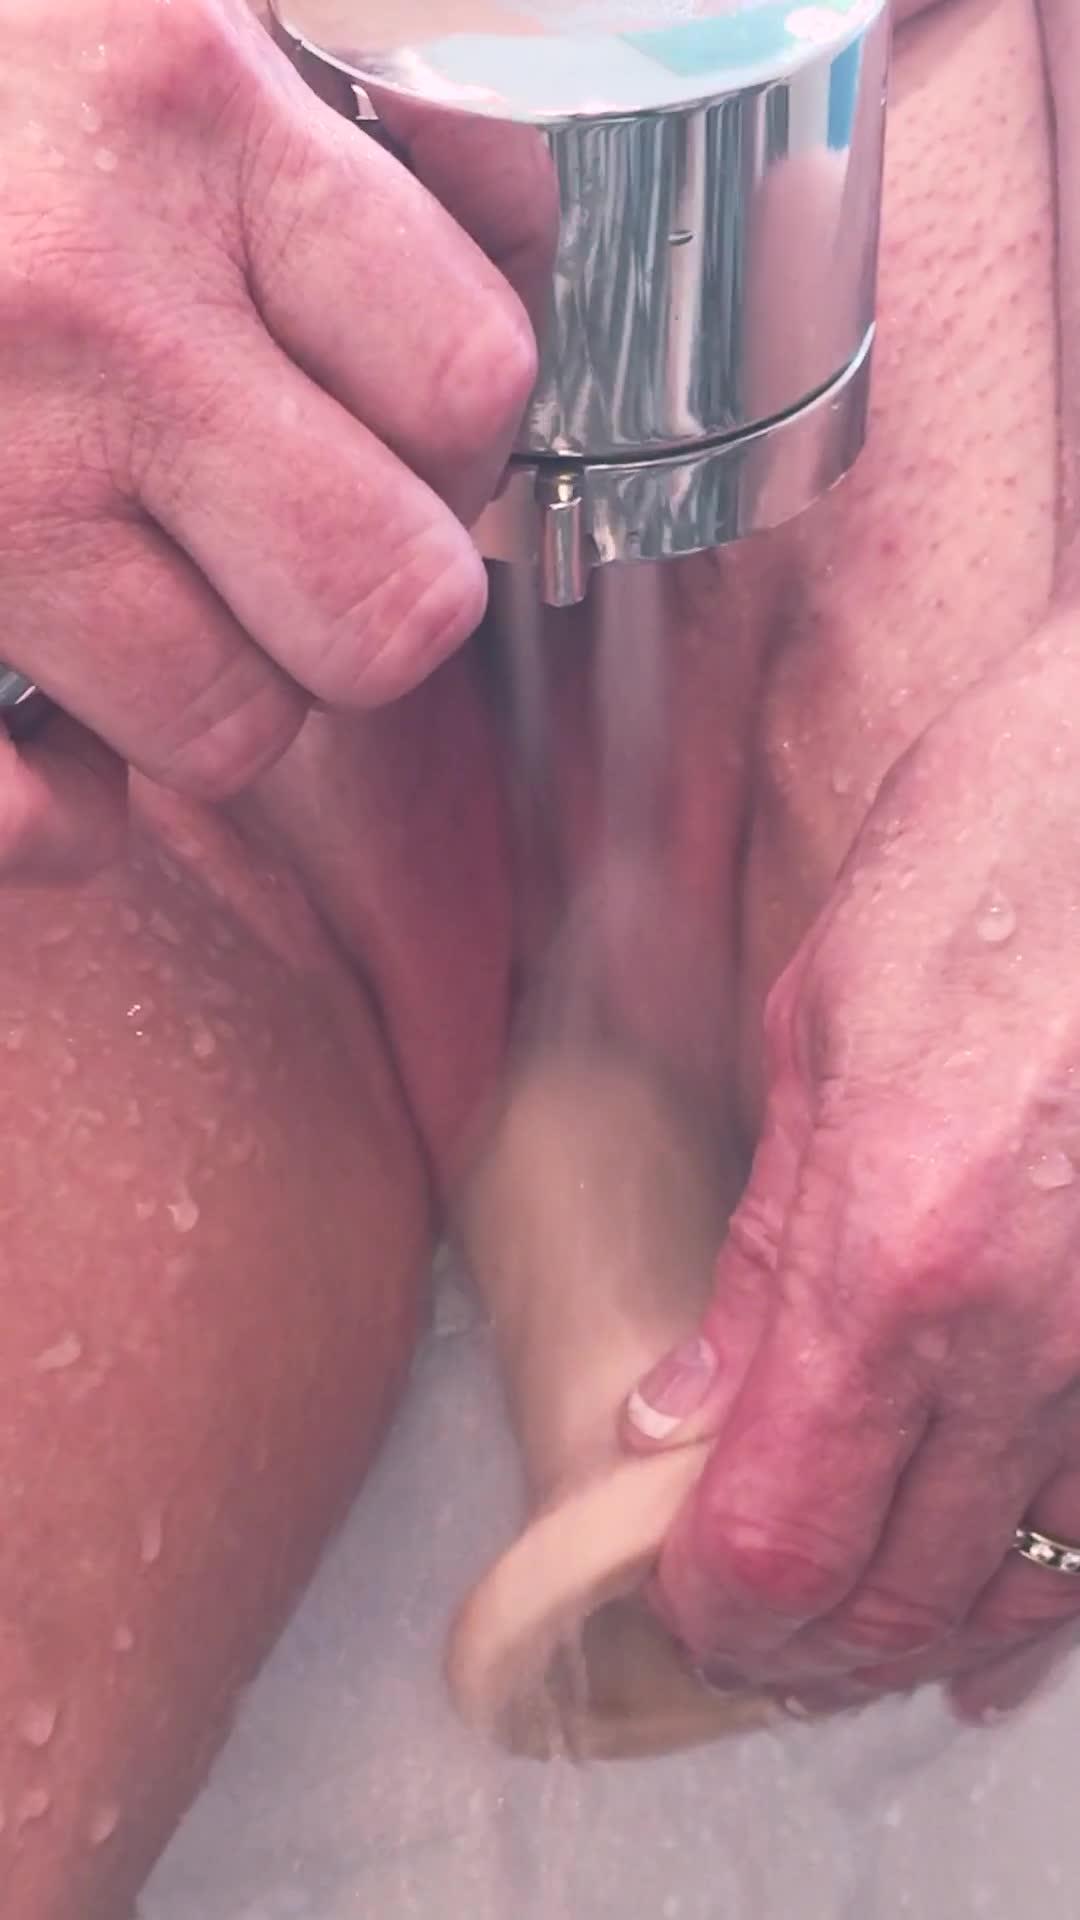 Pic #1GILF Creampie - Masturbation, Toys, Penetration Or Hardcore, Shaved, Close-ups, Pussy Fucking